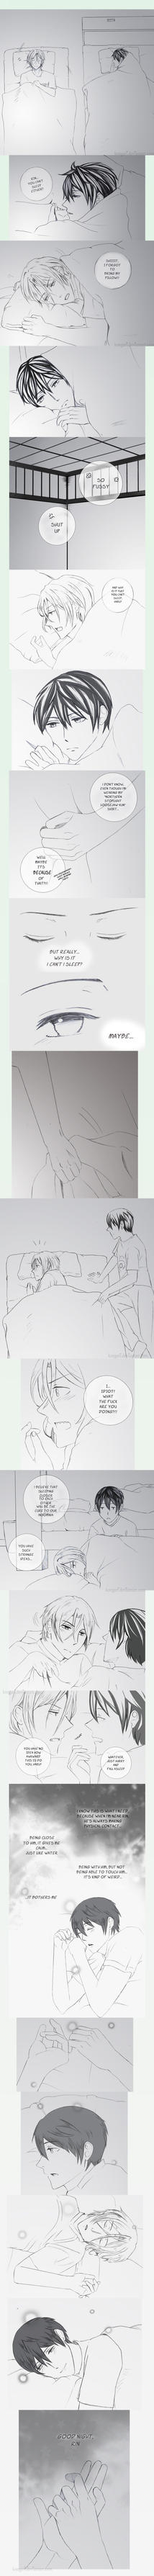 RinHaru - Goodnight, Rin by Pleionne